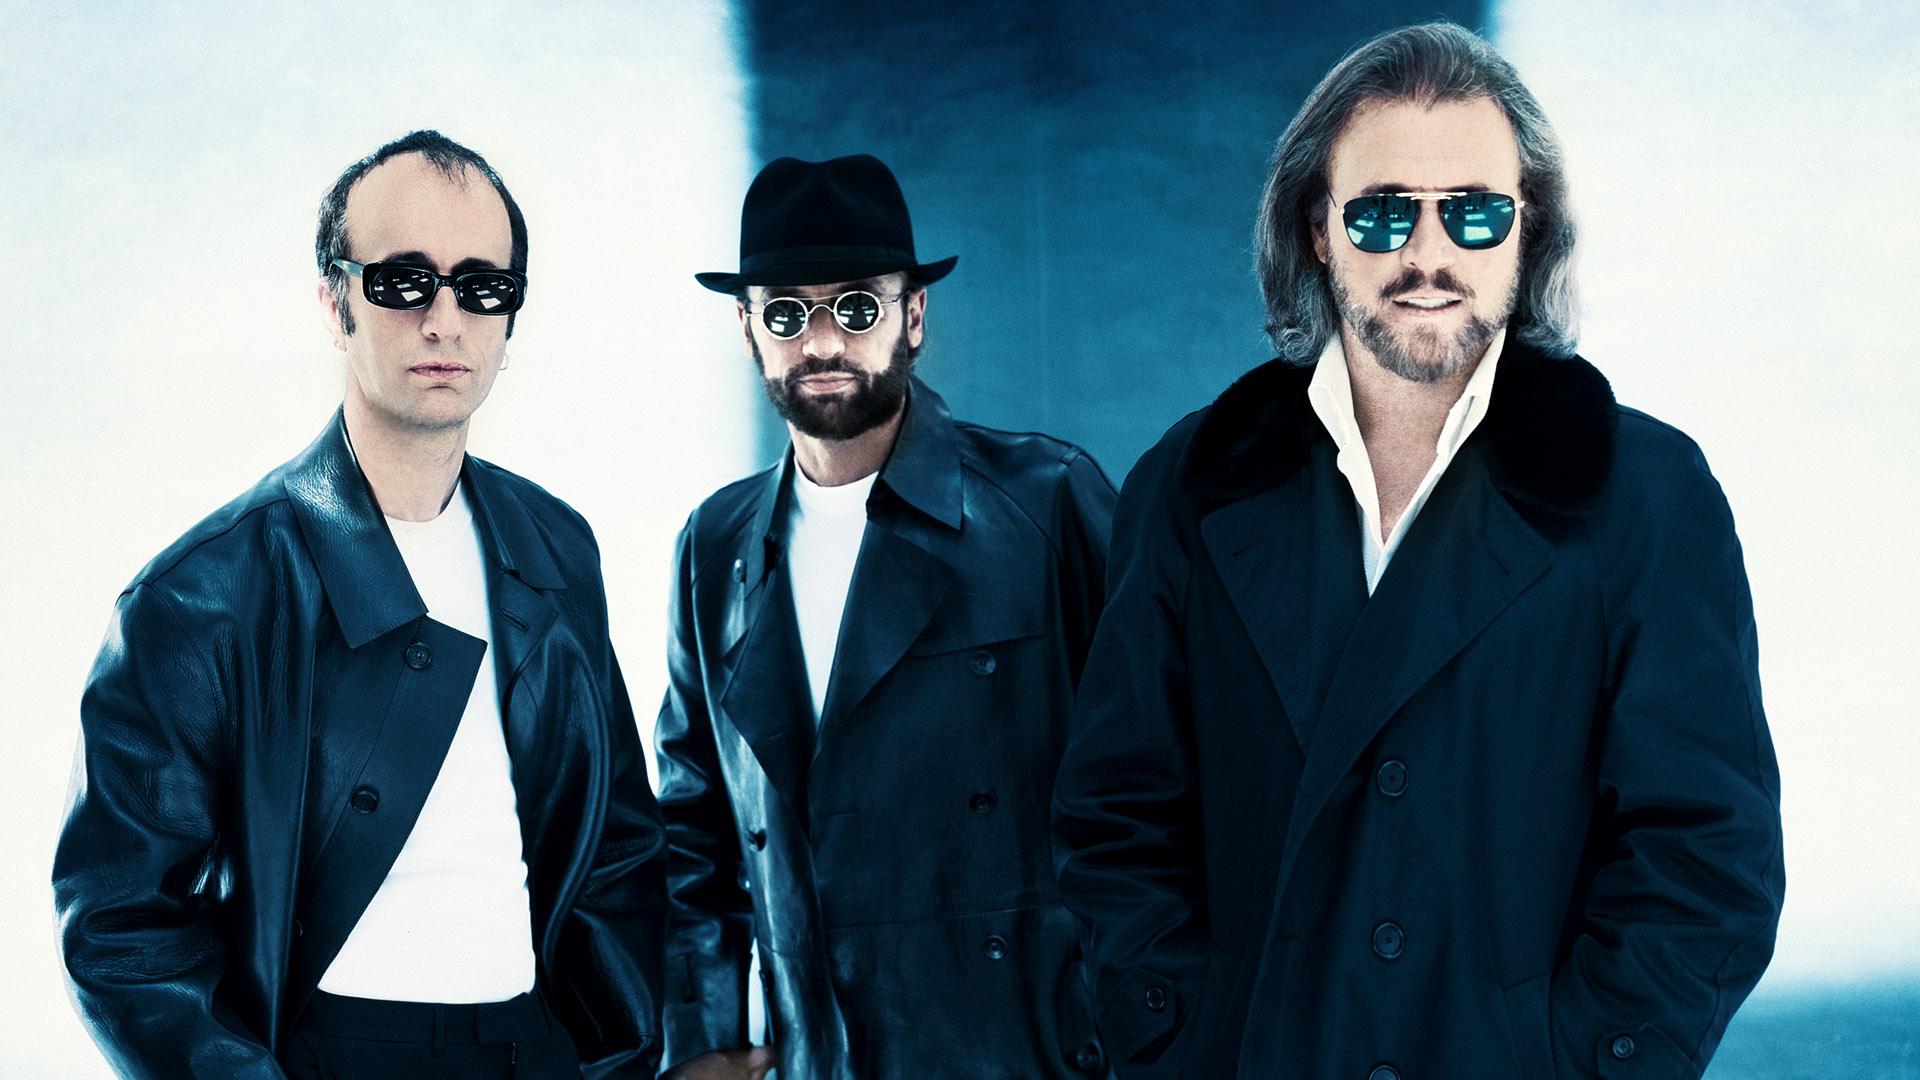 How Deep Is Your Love av Bee Gees